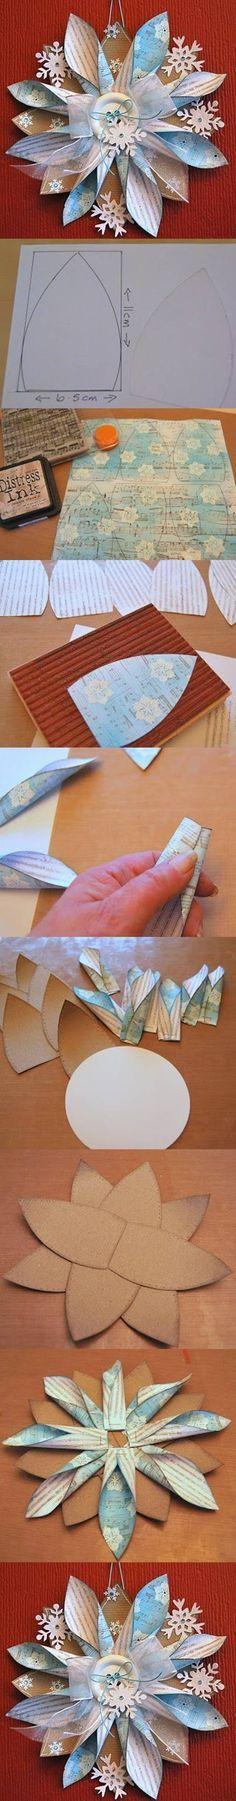 DIY Paper Flower Ornaments DIY Projects | UsefulDIY.com Follow us on Facebook ==> https://www.facebook.com/UsefulDiy